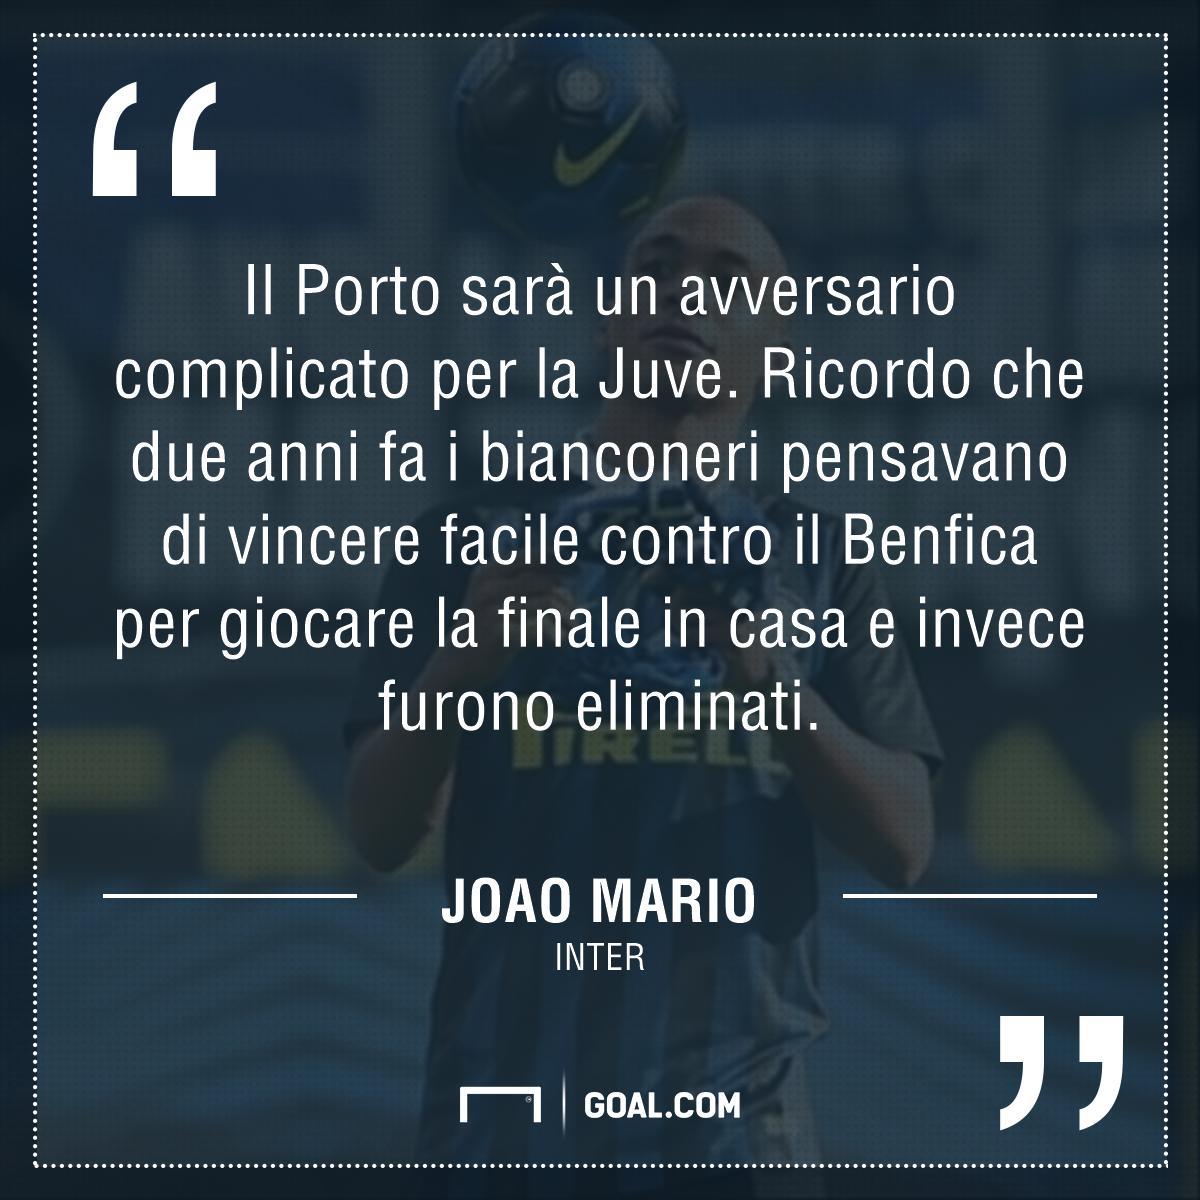 Cristiano Ronaldo Inter, Joao Mario: